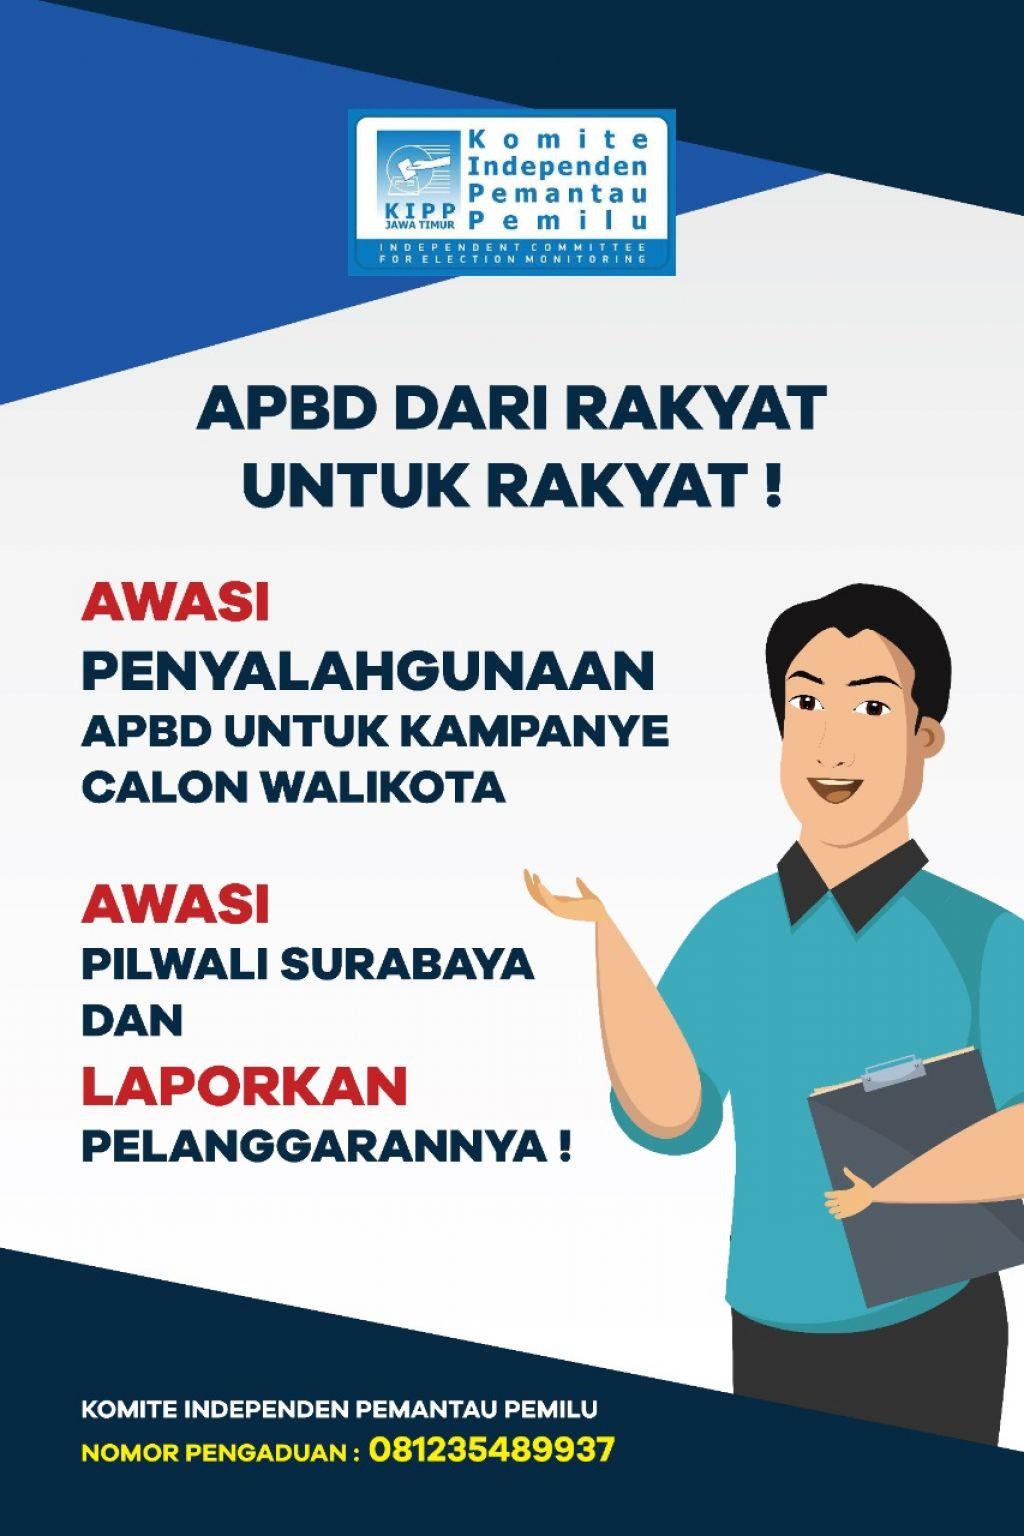 Imbauan Komite Independen Pemantau Pemilu (KIPP) Jawa Timur terkait Pilkada